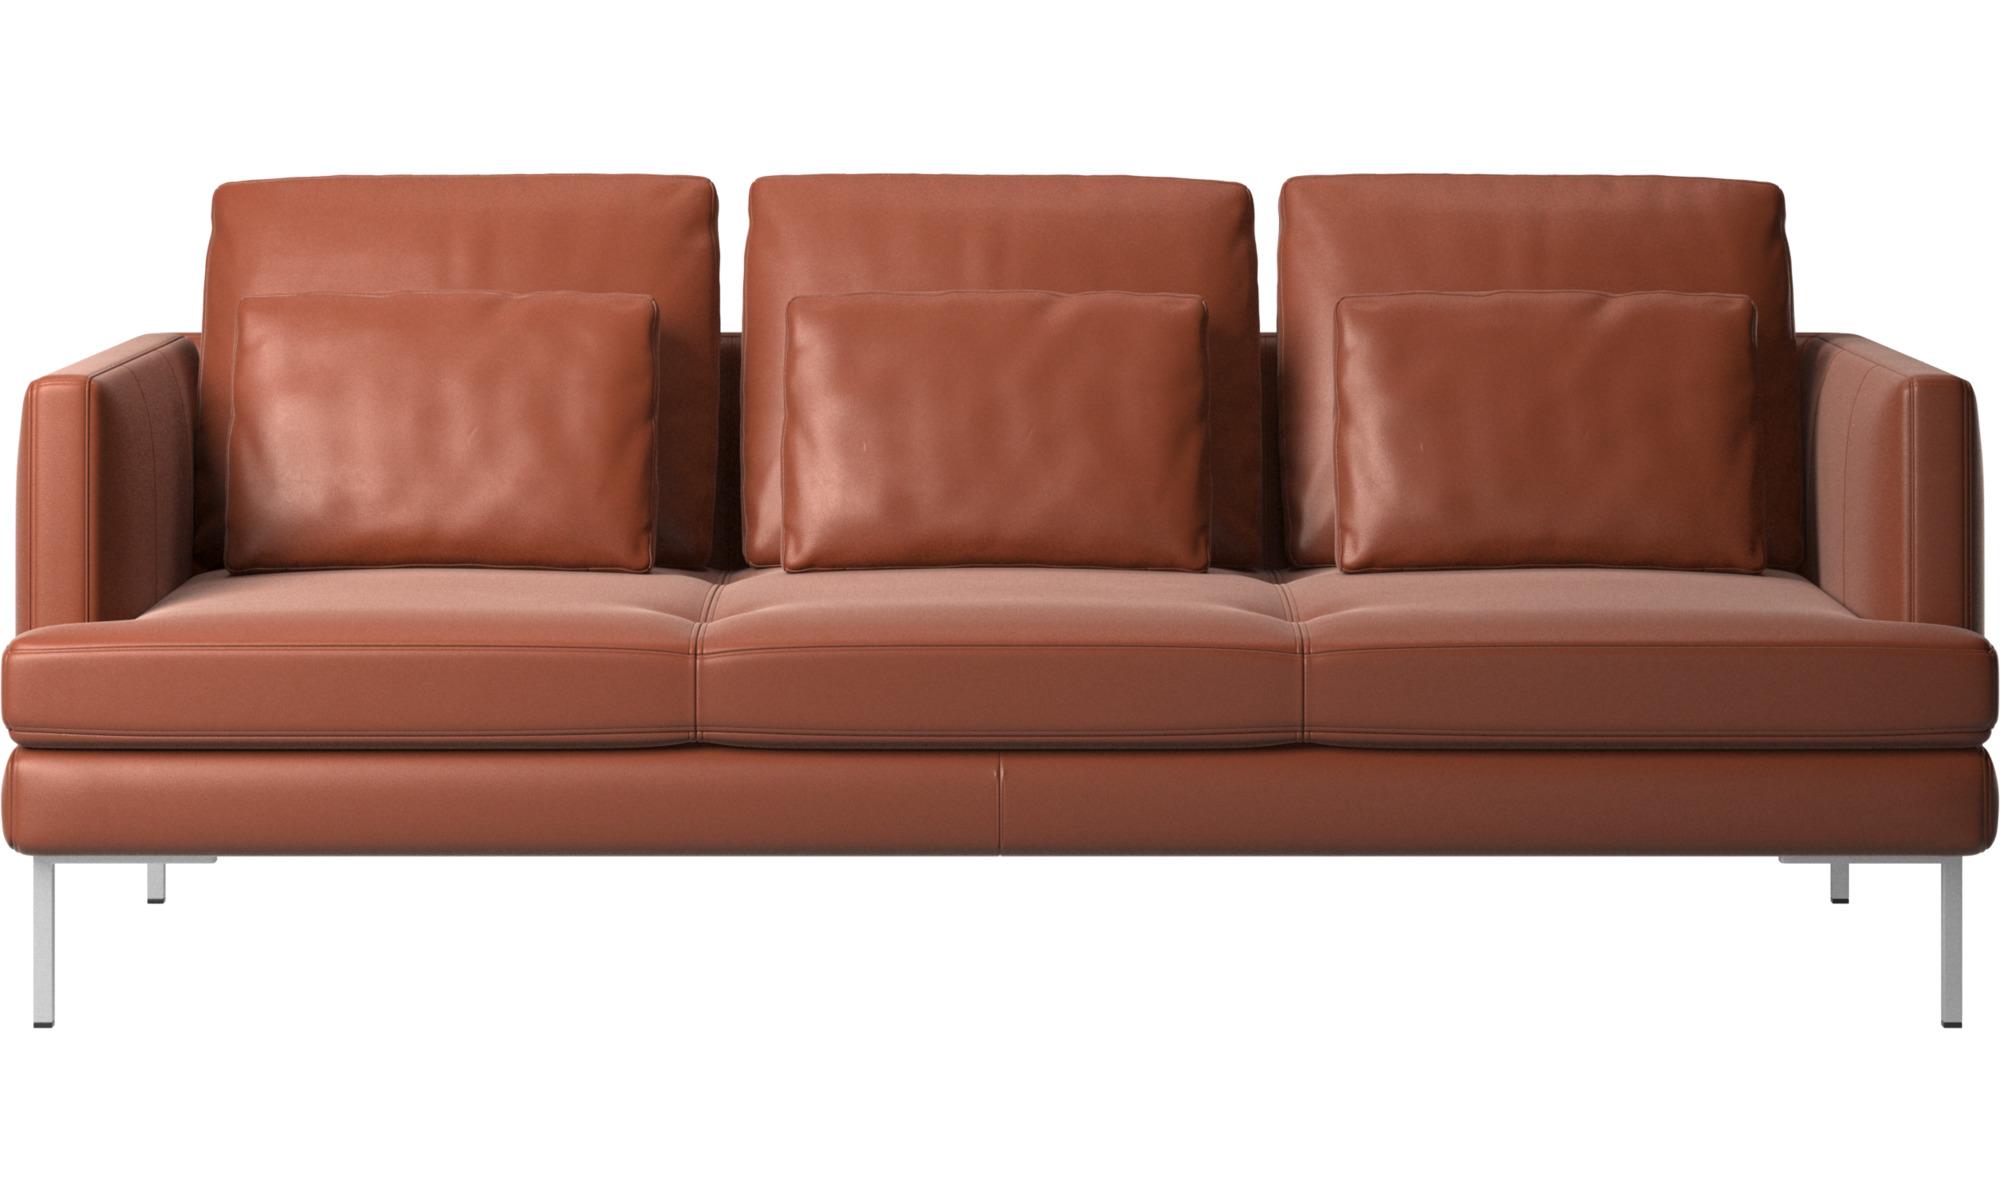 3 seater sofas istra 2 sofa boconcept. Black Bedroom Furniture Sets. Home Design Ideas